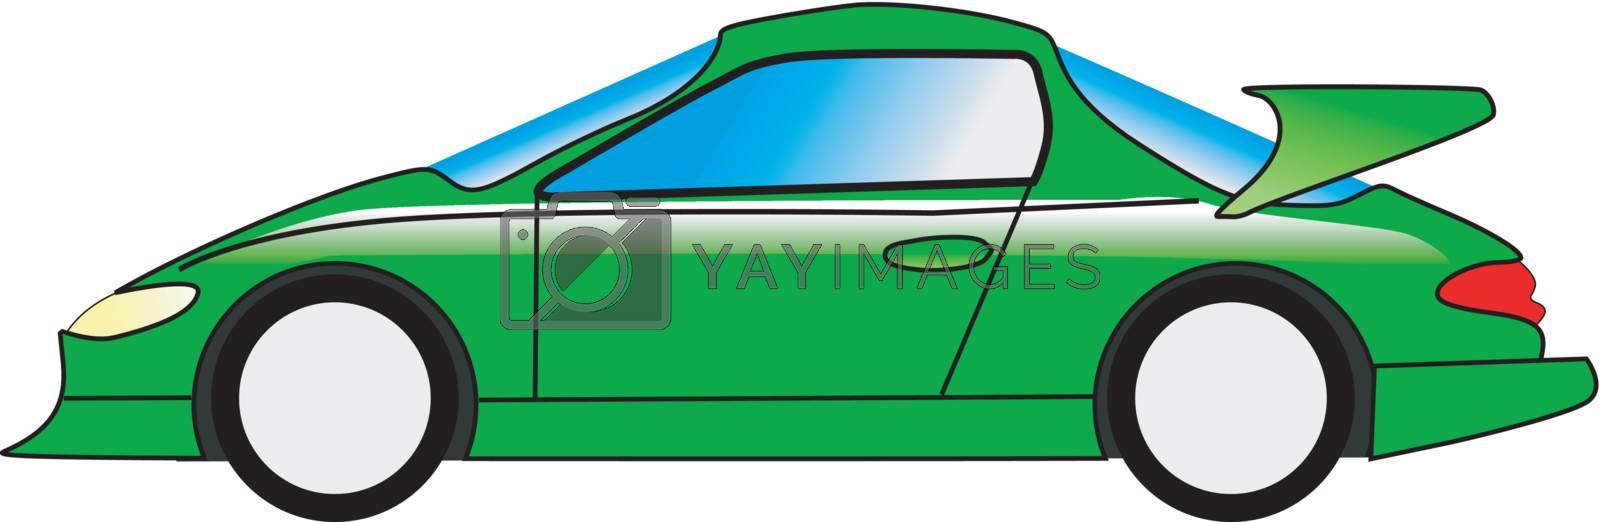 a cartoon stylish illustration of sport car